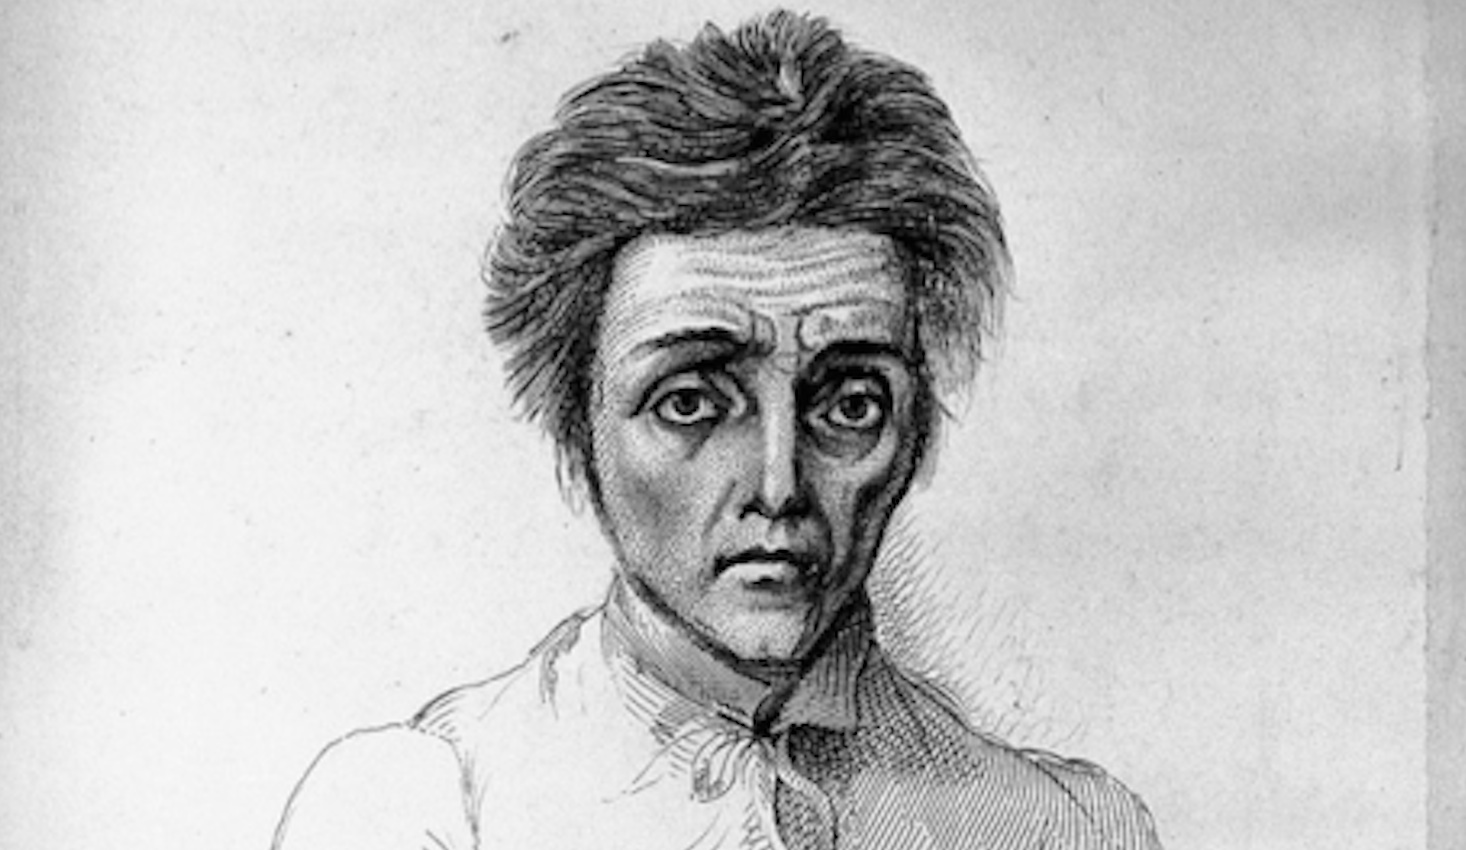 Mental Illness 1840s